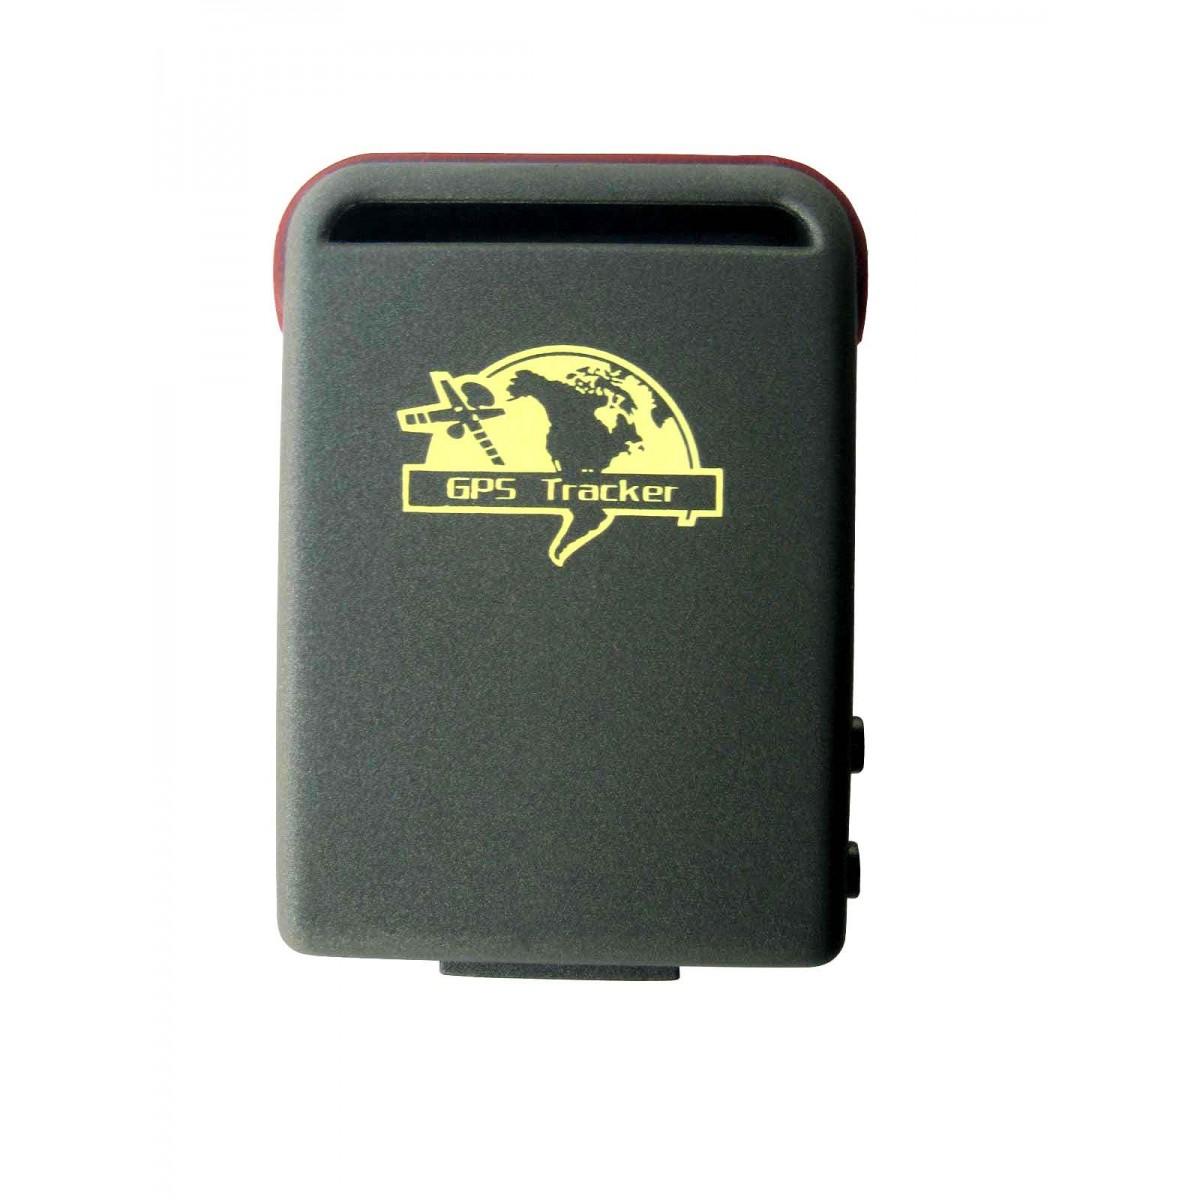 save express tracker